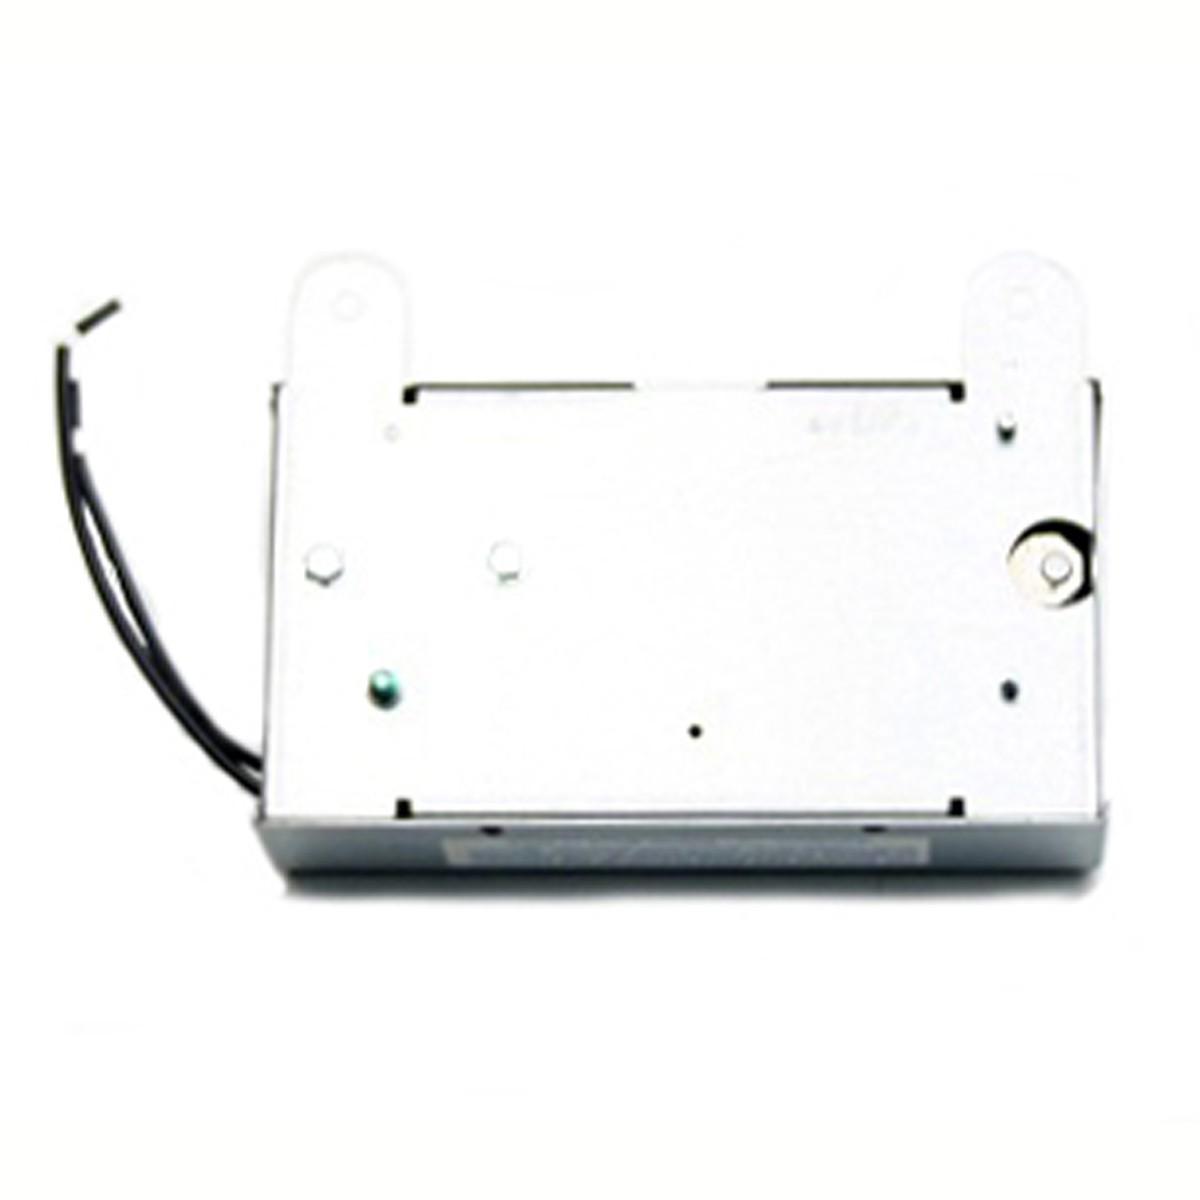 Ventamatic Xxduostat Adjustable Dual Thermostat Humidistat